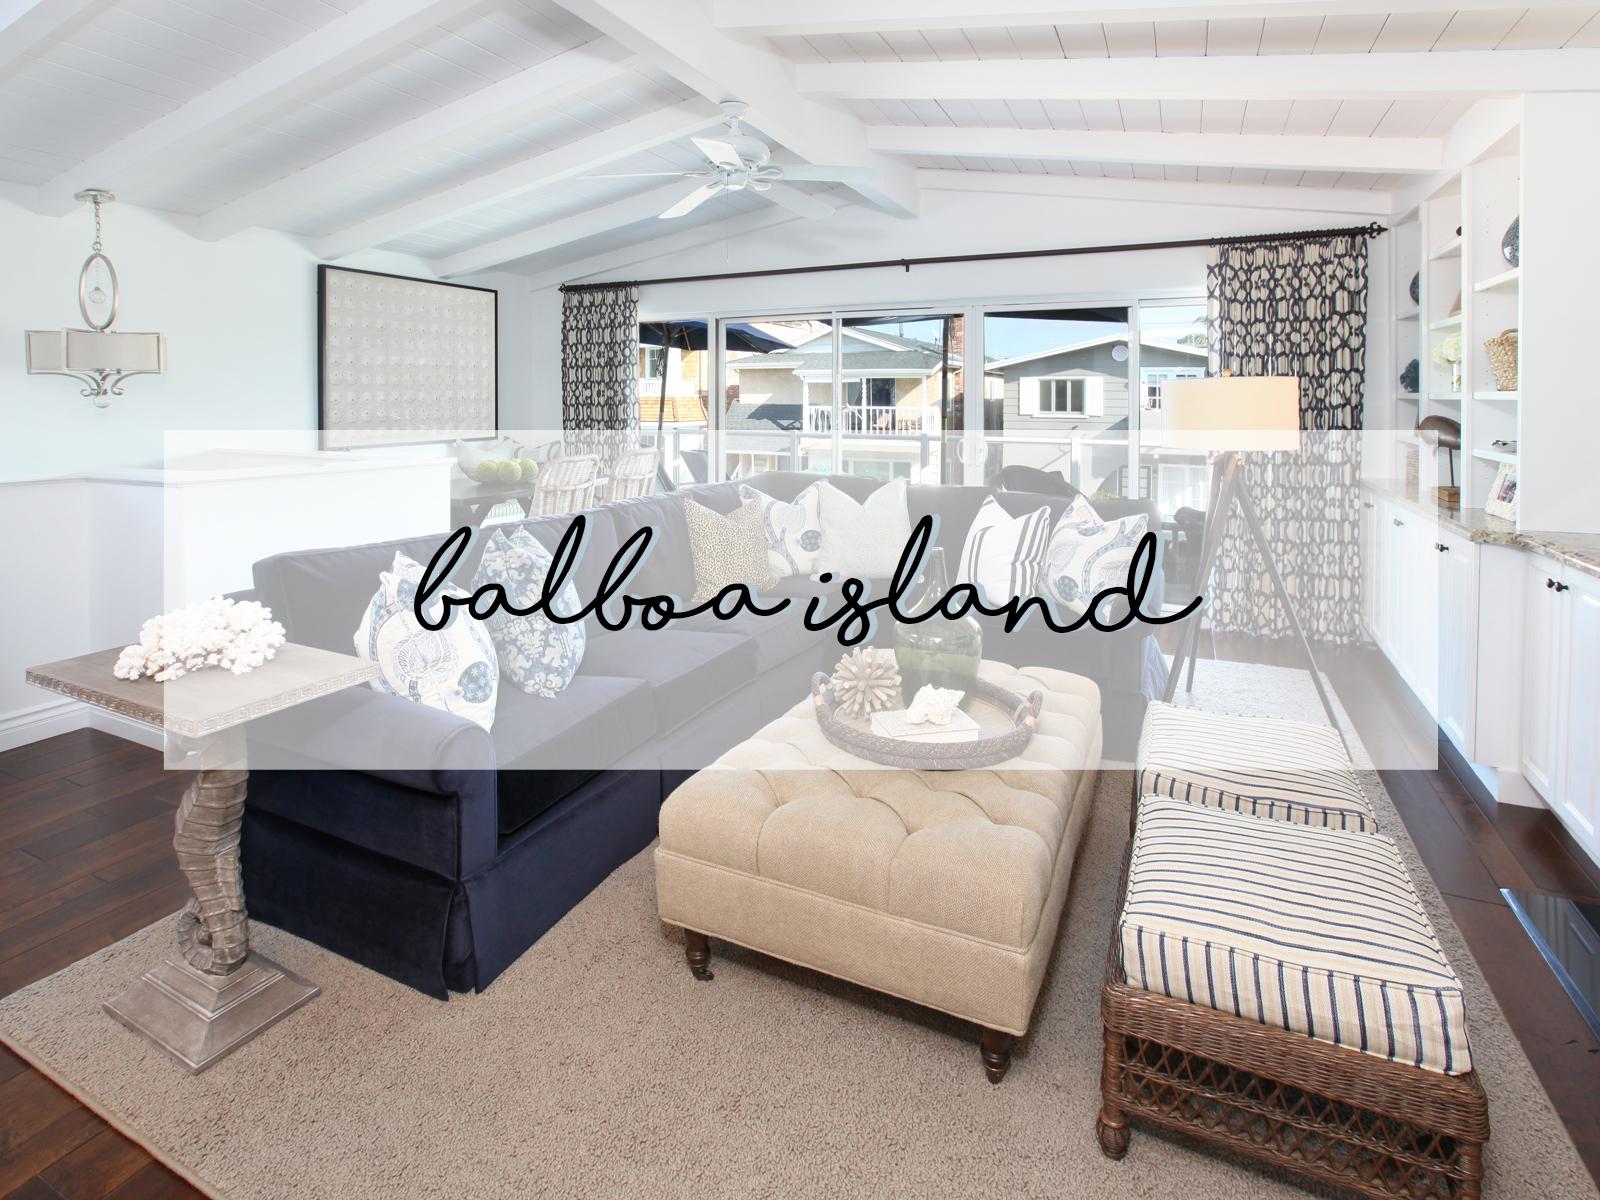 blackband_design_balboa_island